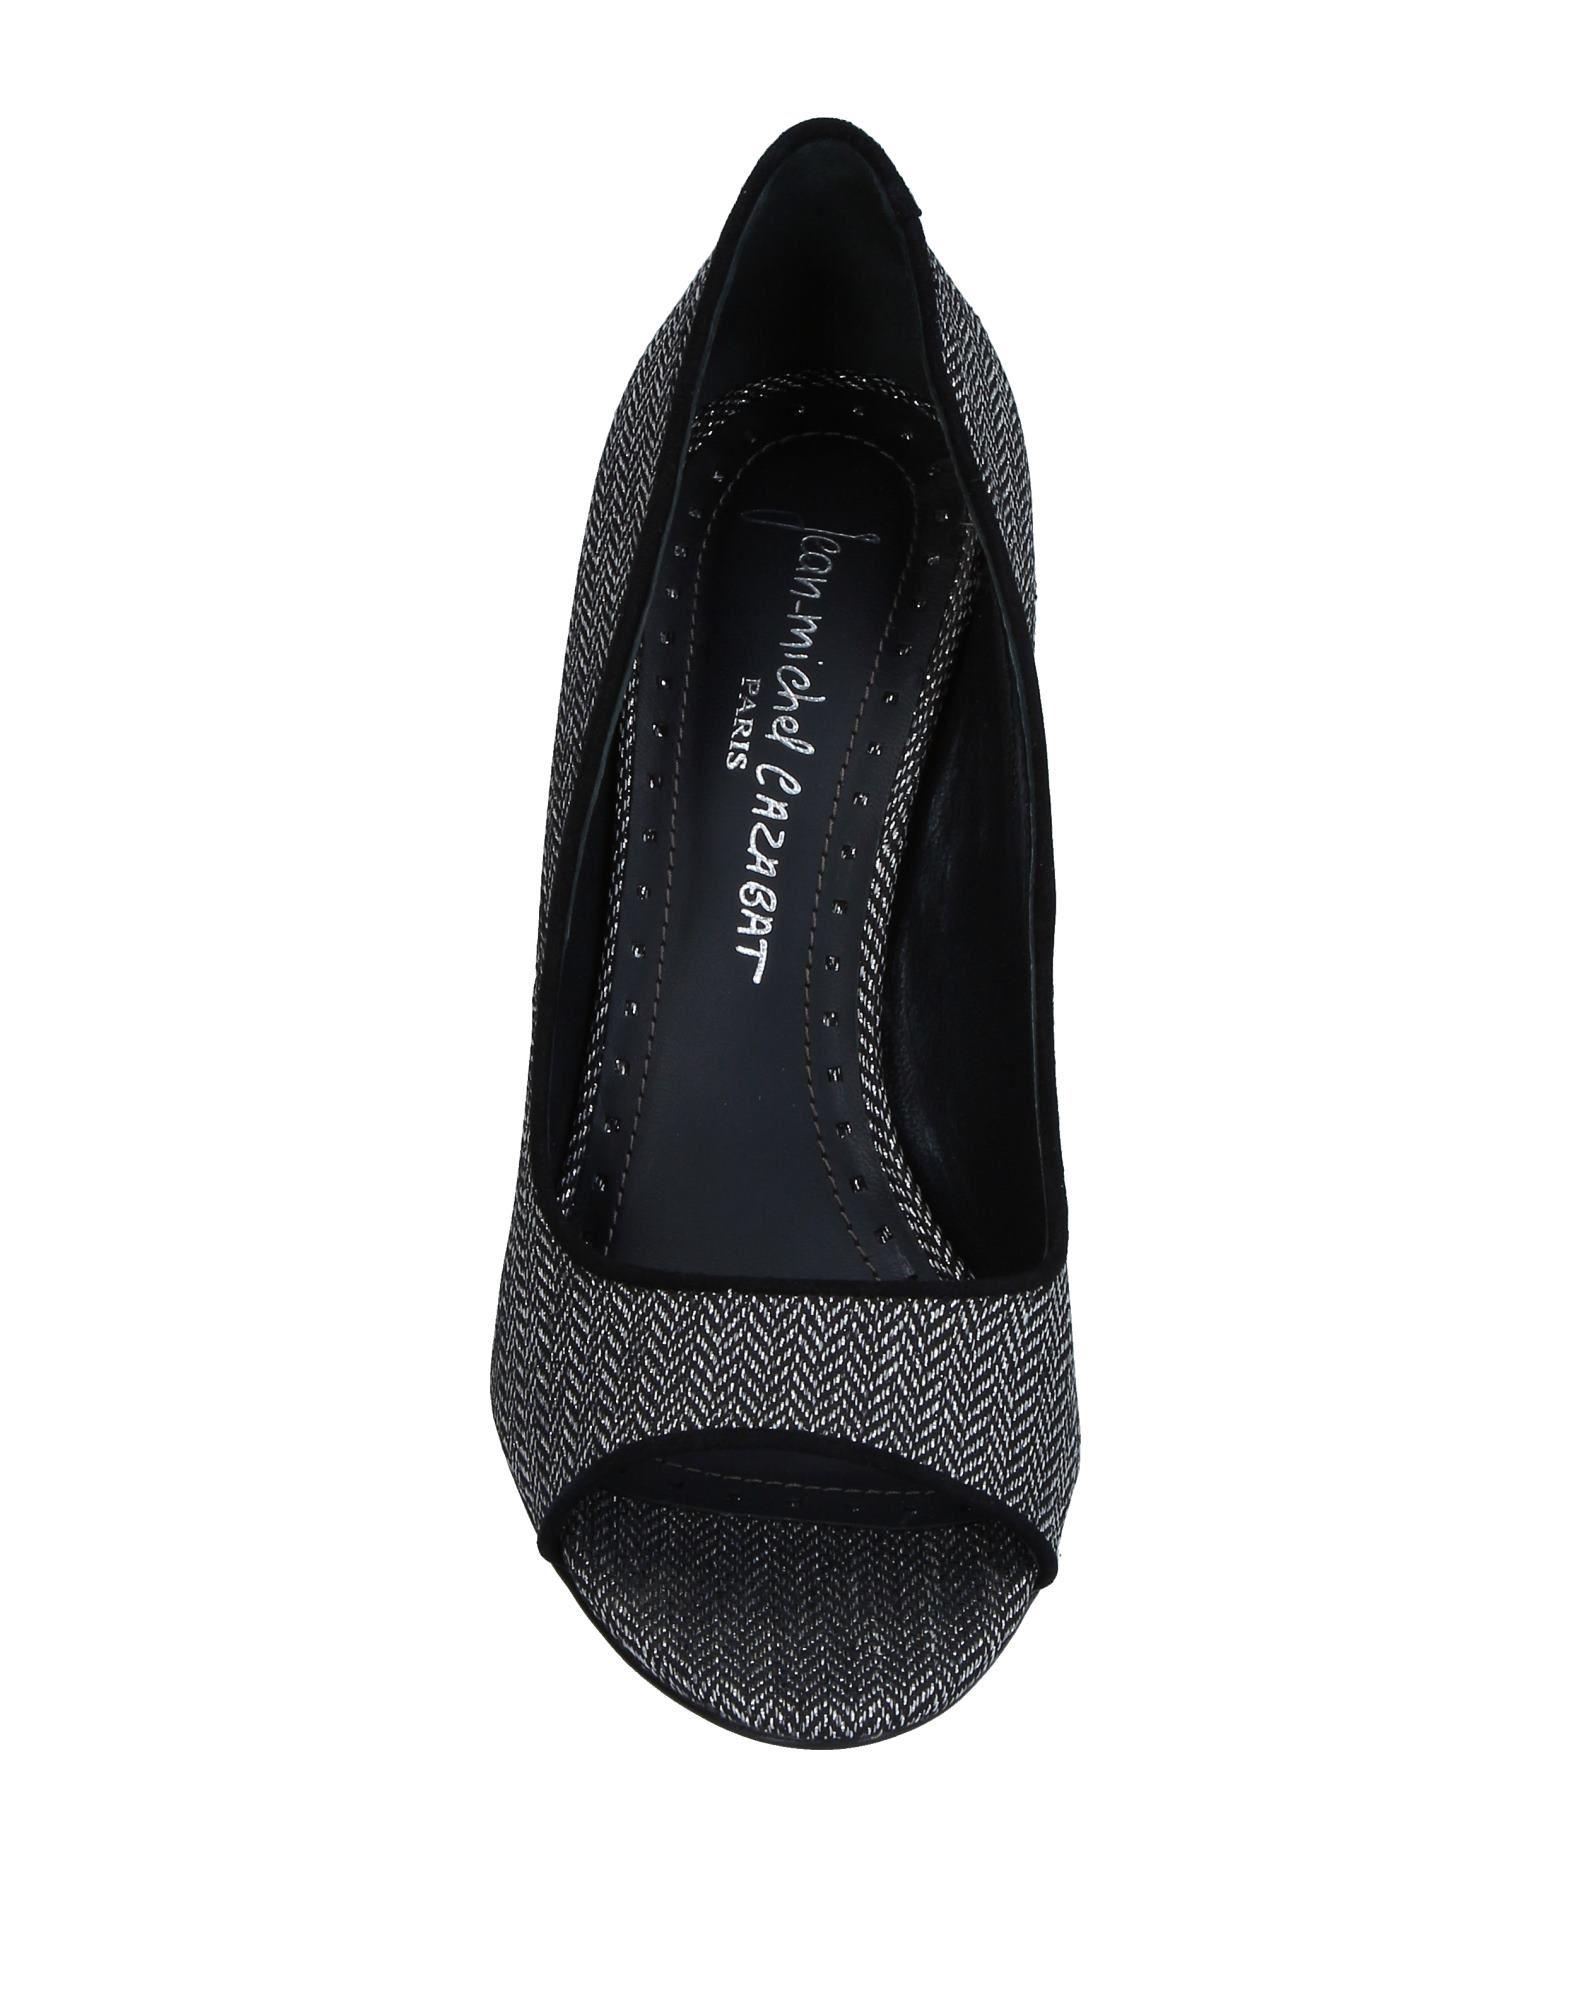 Haltbare 11363582EM Mode billige Schuhe Jean 11363582EM Haltbare Beliebte Schuhe 859bb9